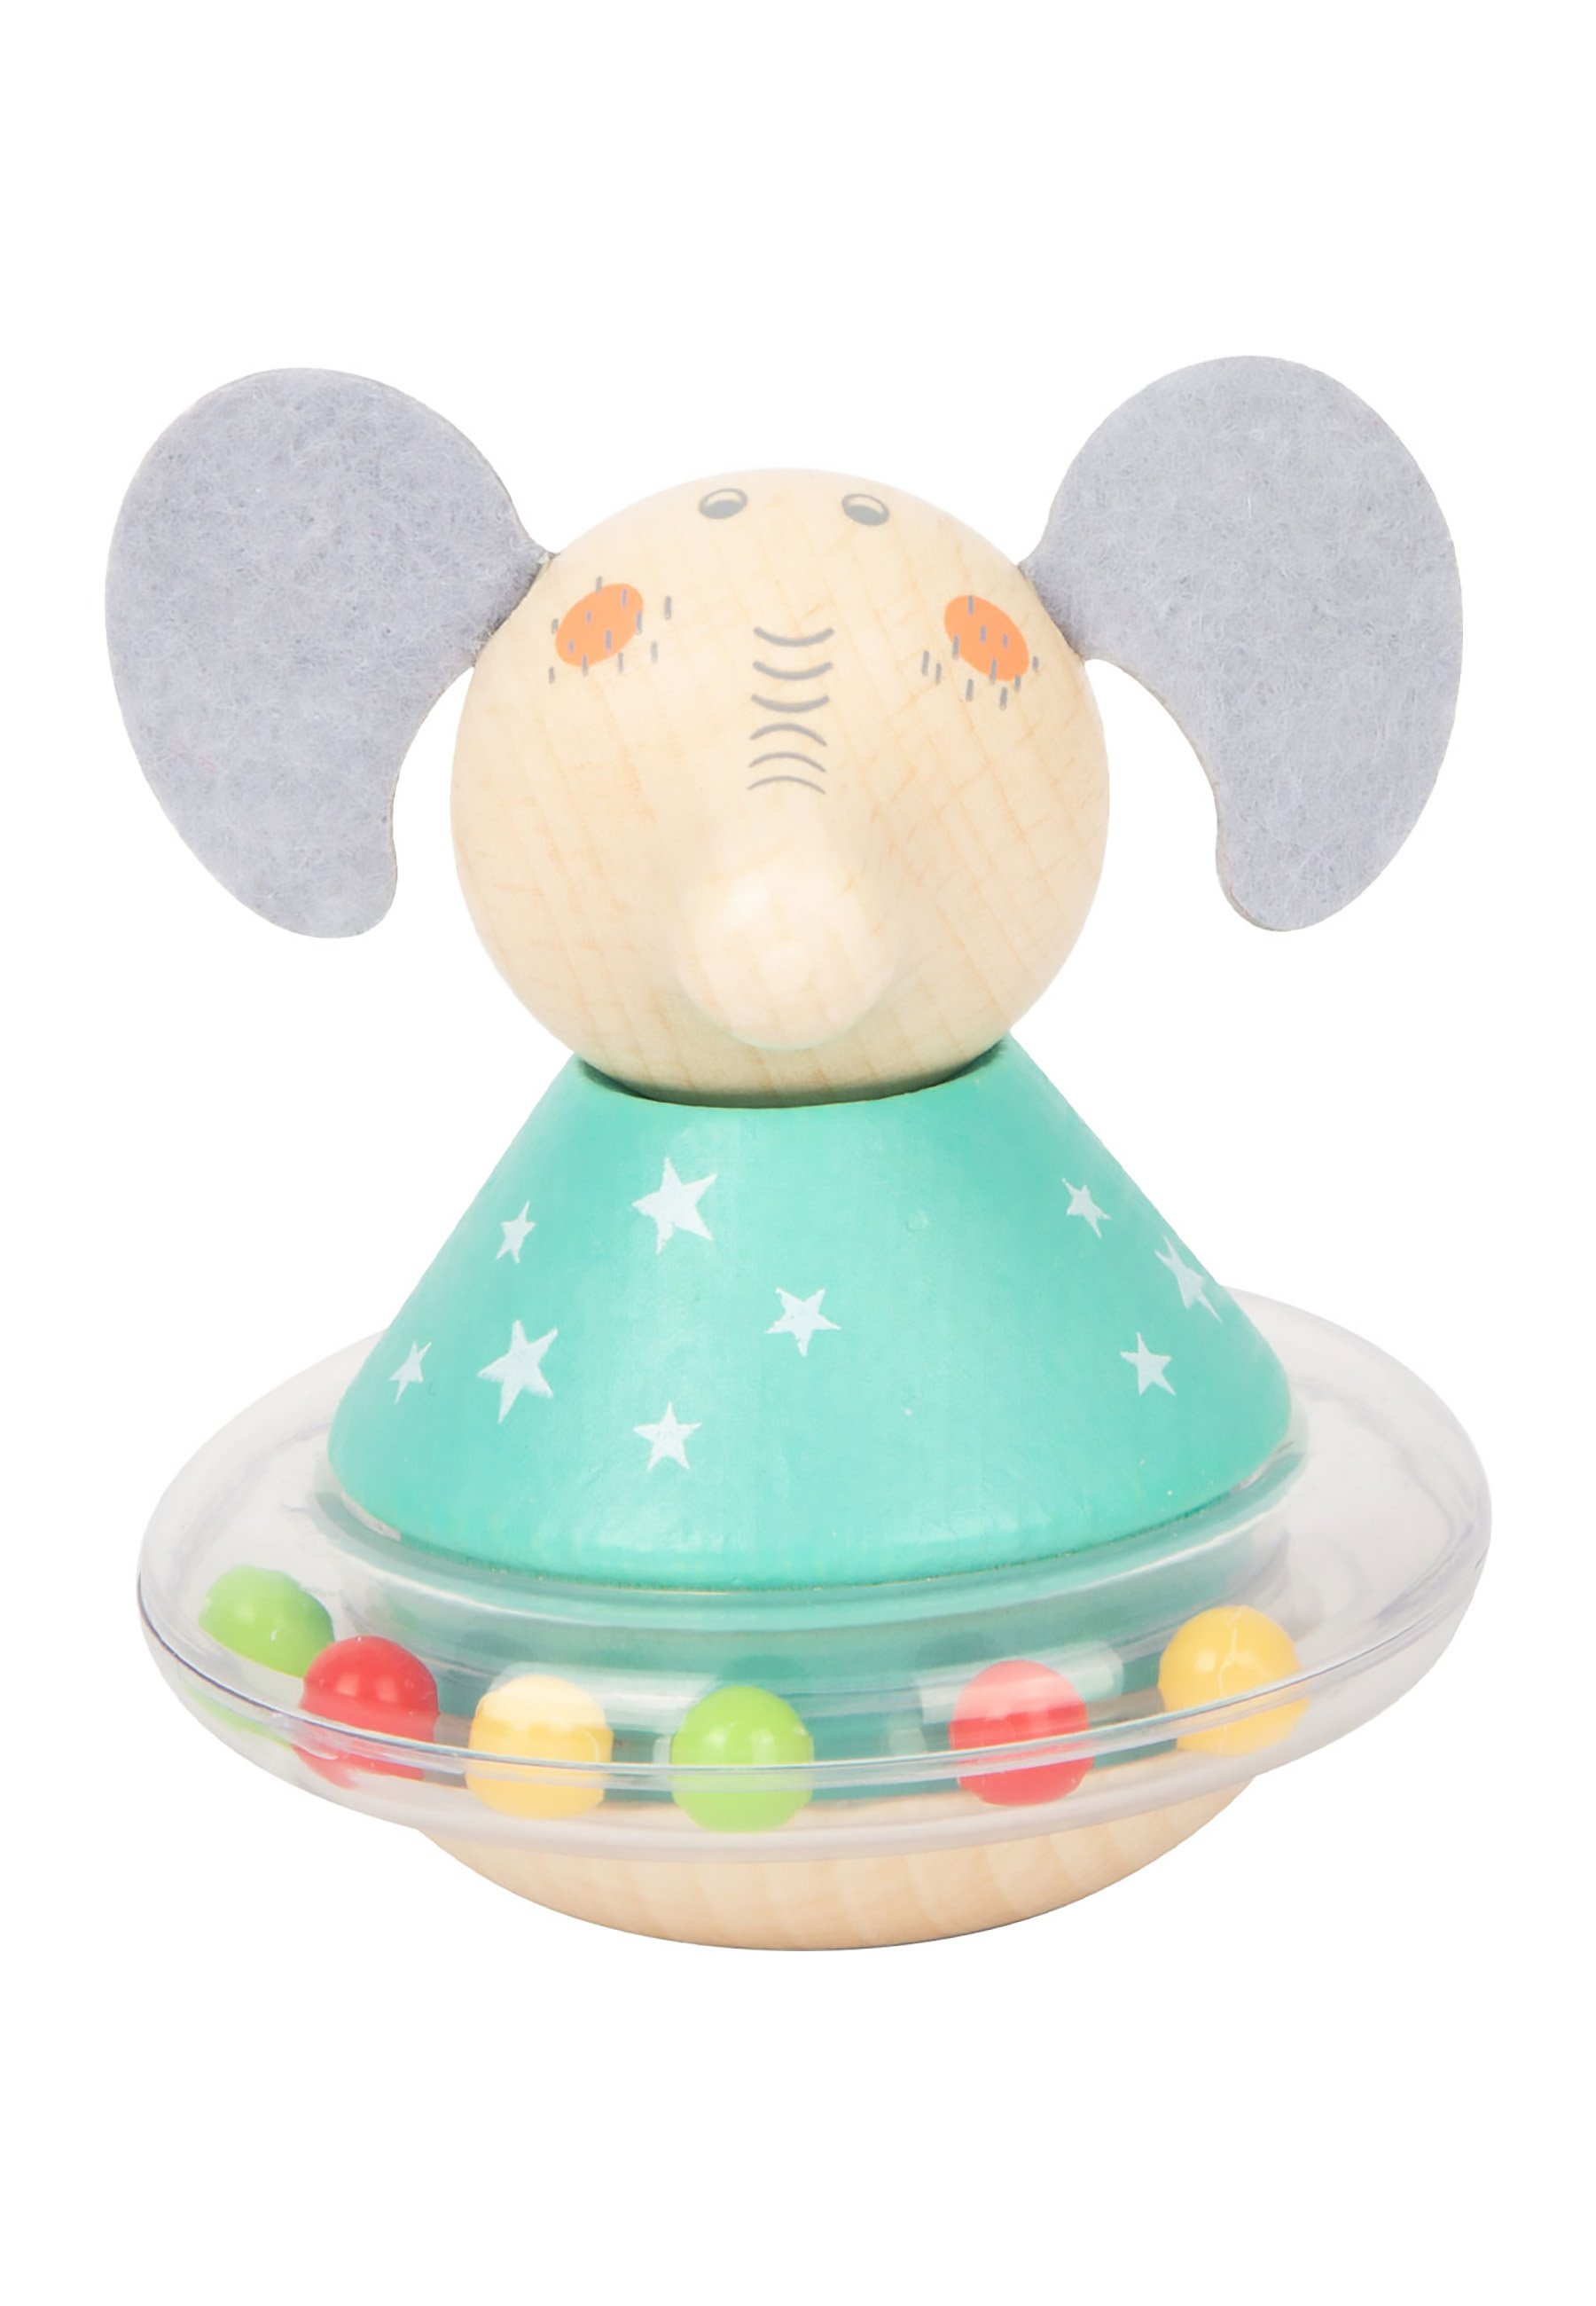 Kinder Baby-Spielzeug